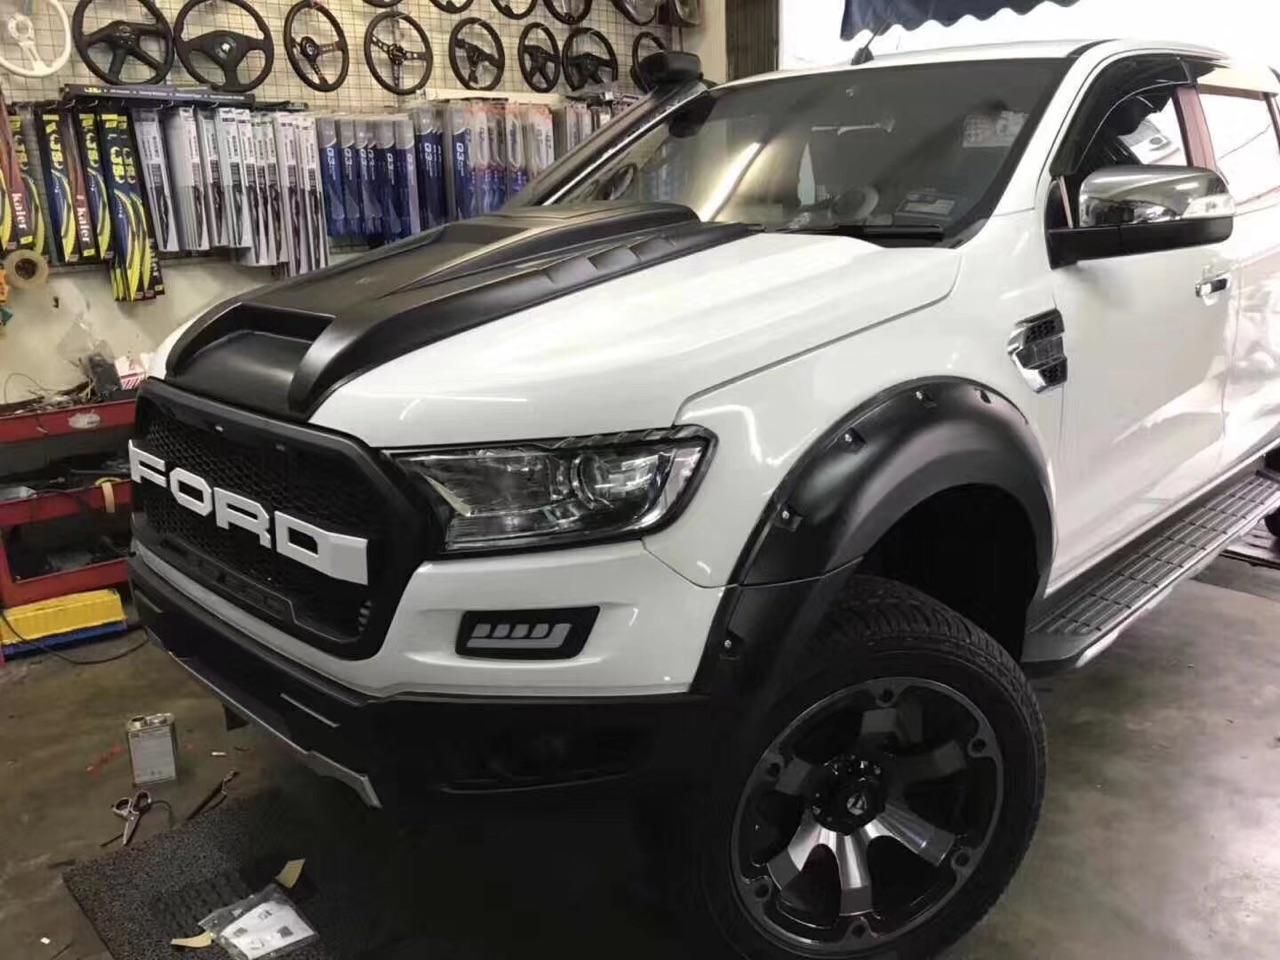 Fits Ford Ranger Xl Xls Xlt Wildtrak Mk2 T7 15 18 Raptor Body Kit New